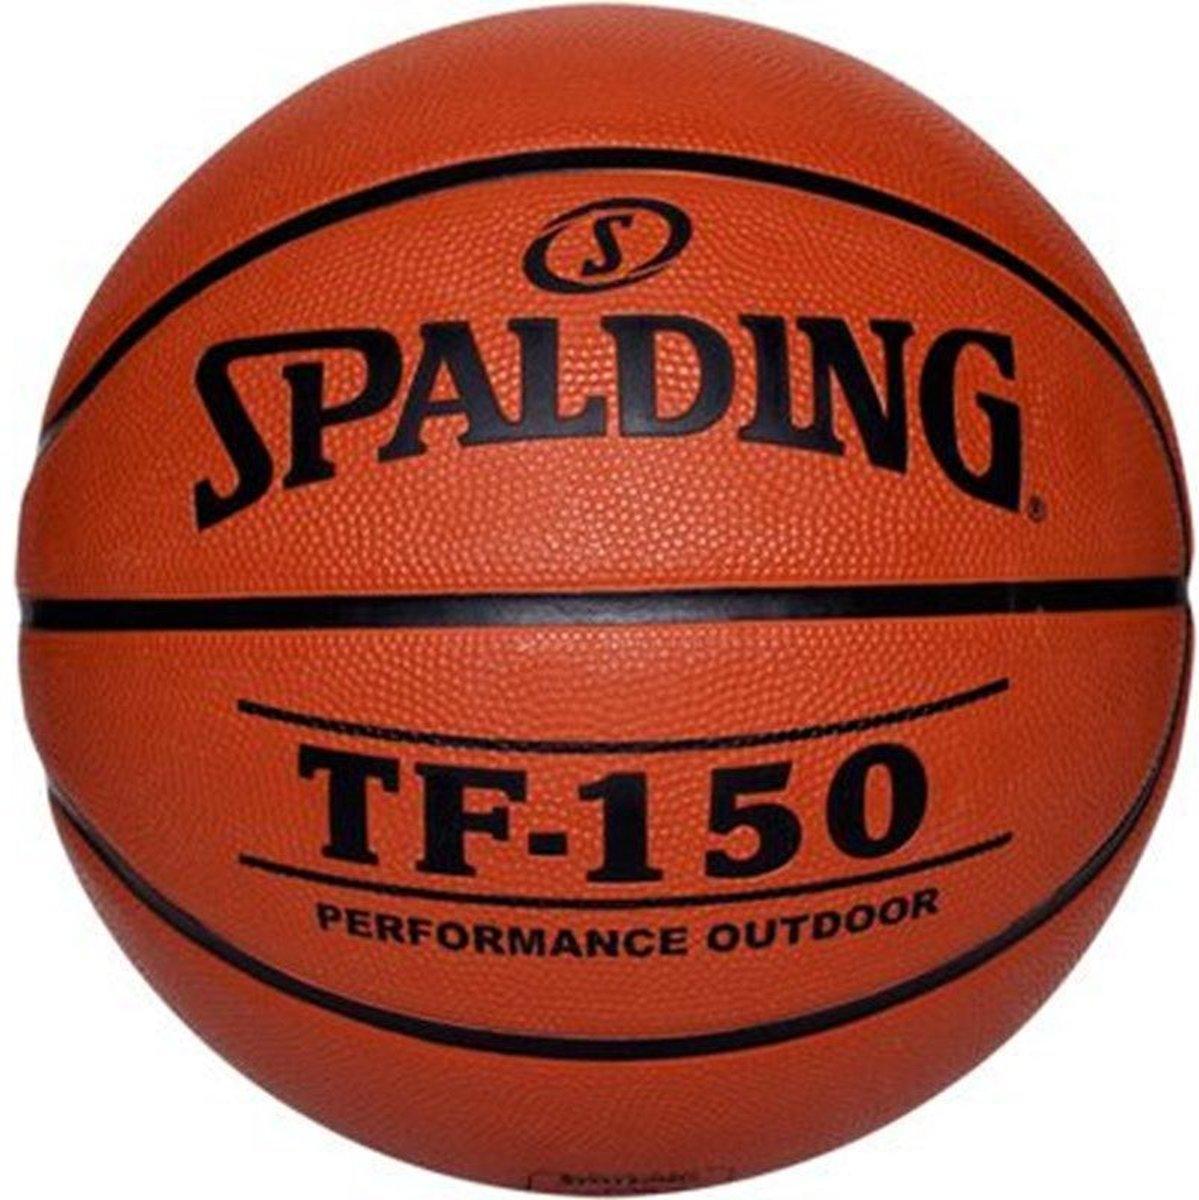 Basketbal outdoor Spalding TF150 maat 7